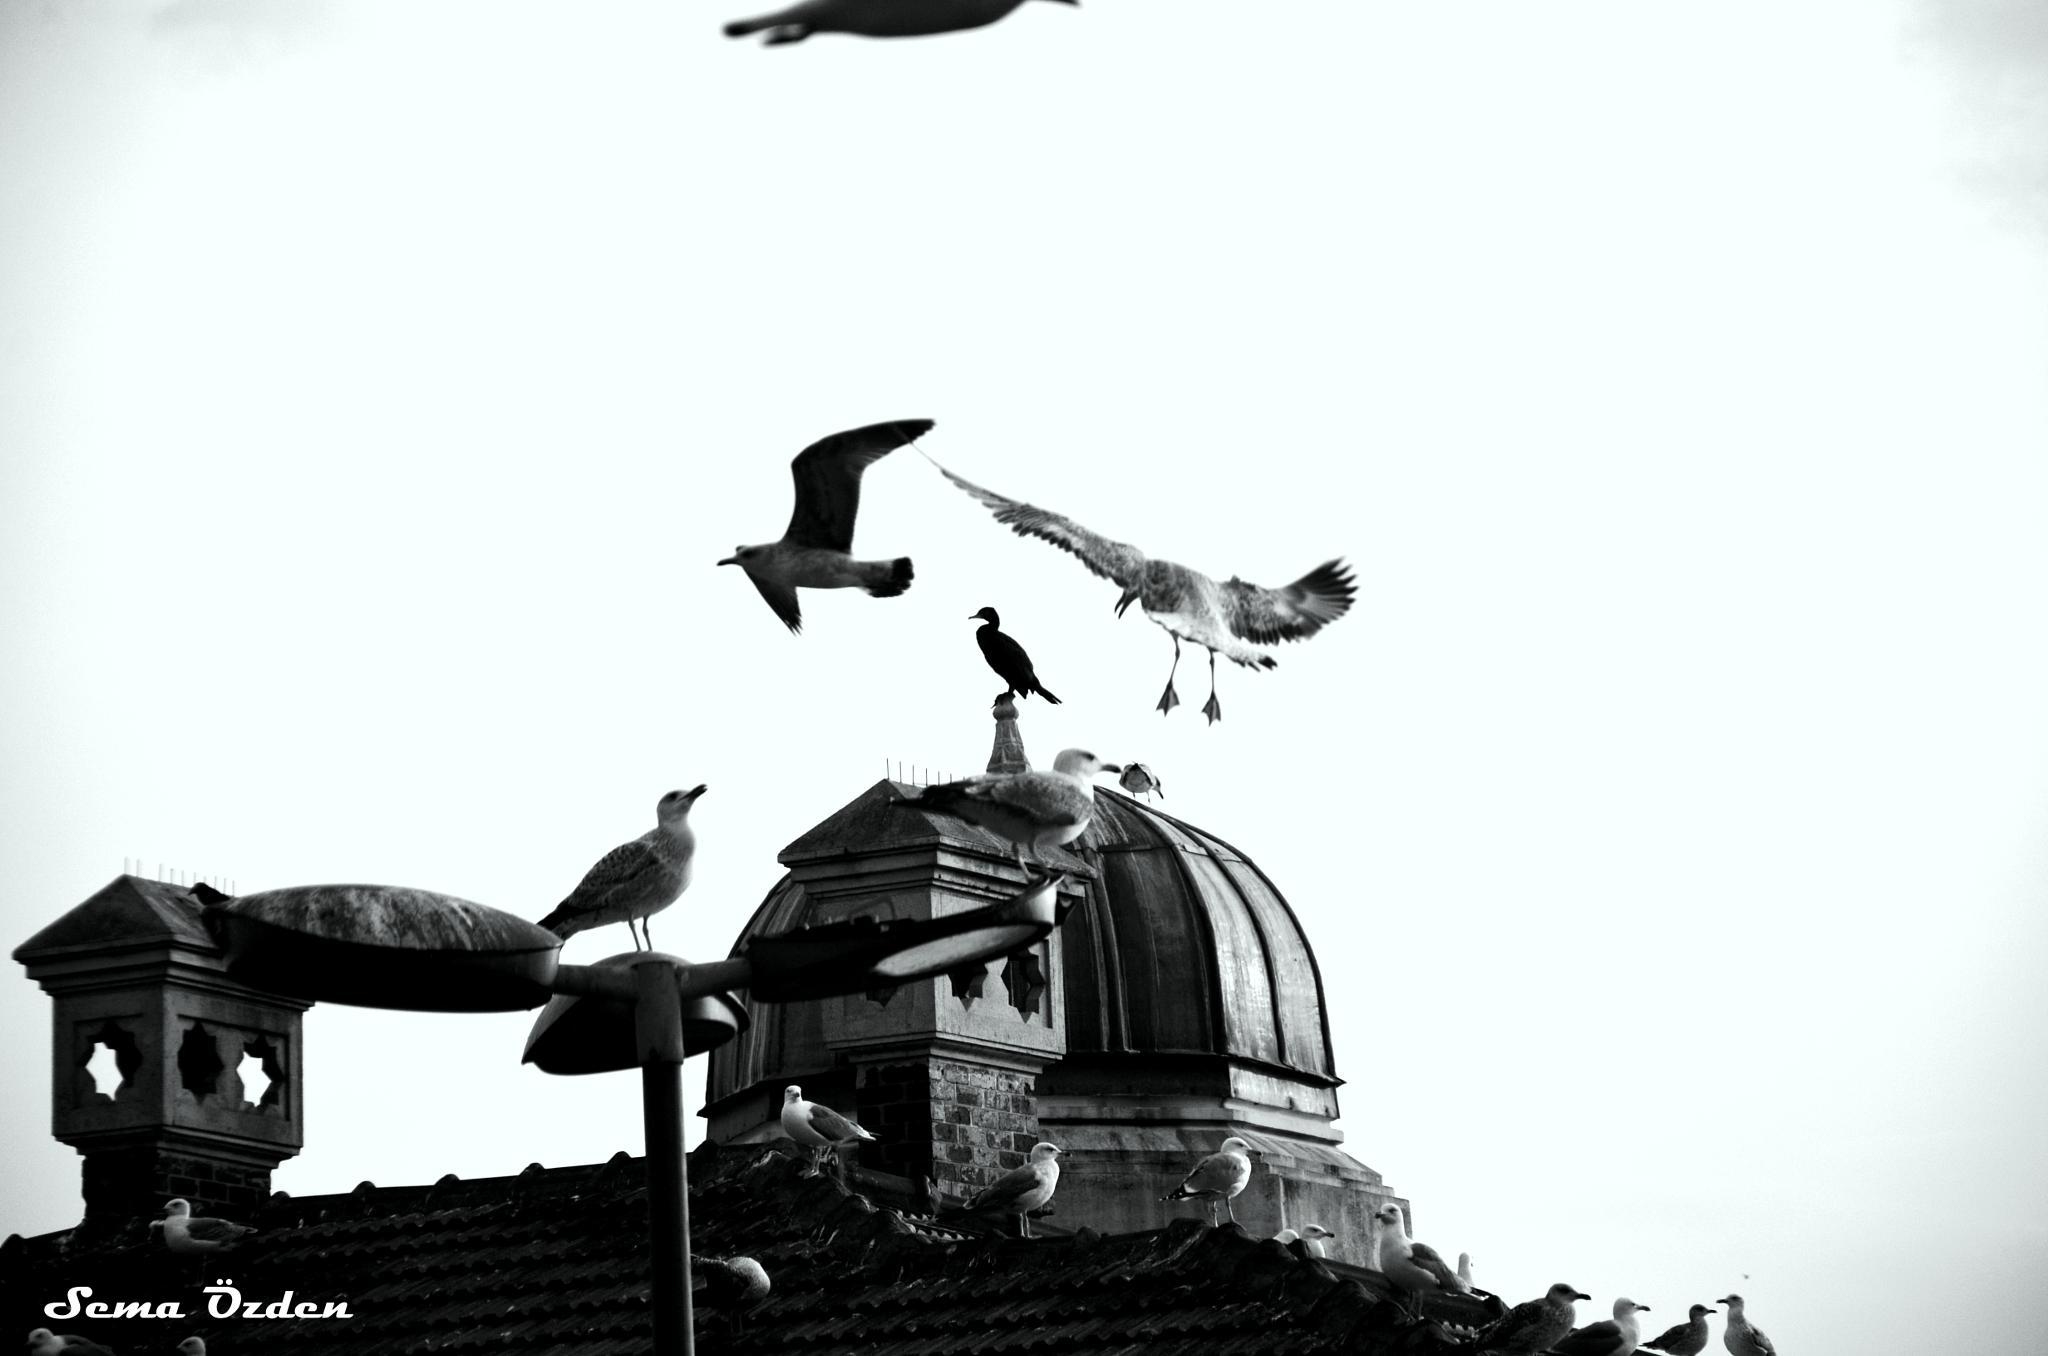 Martı#seagull by Sema Ünlü Özden